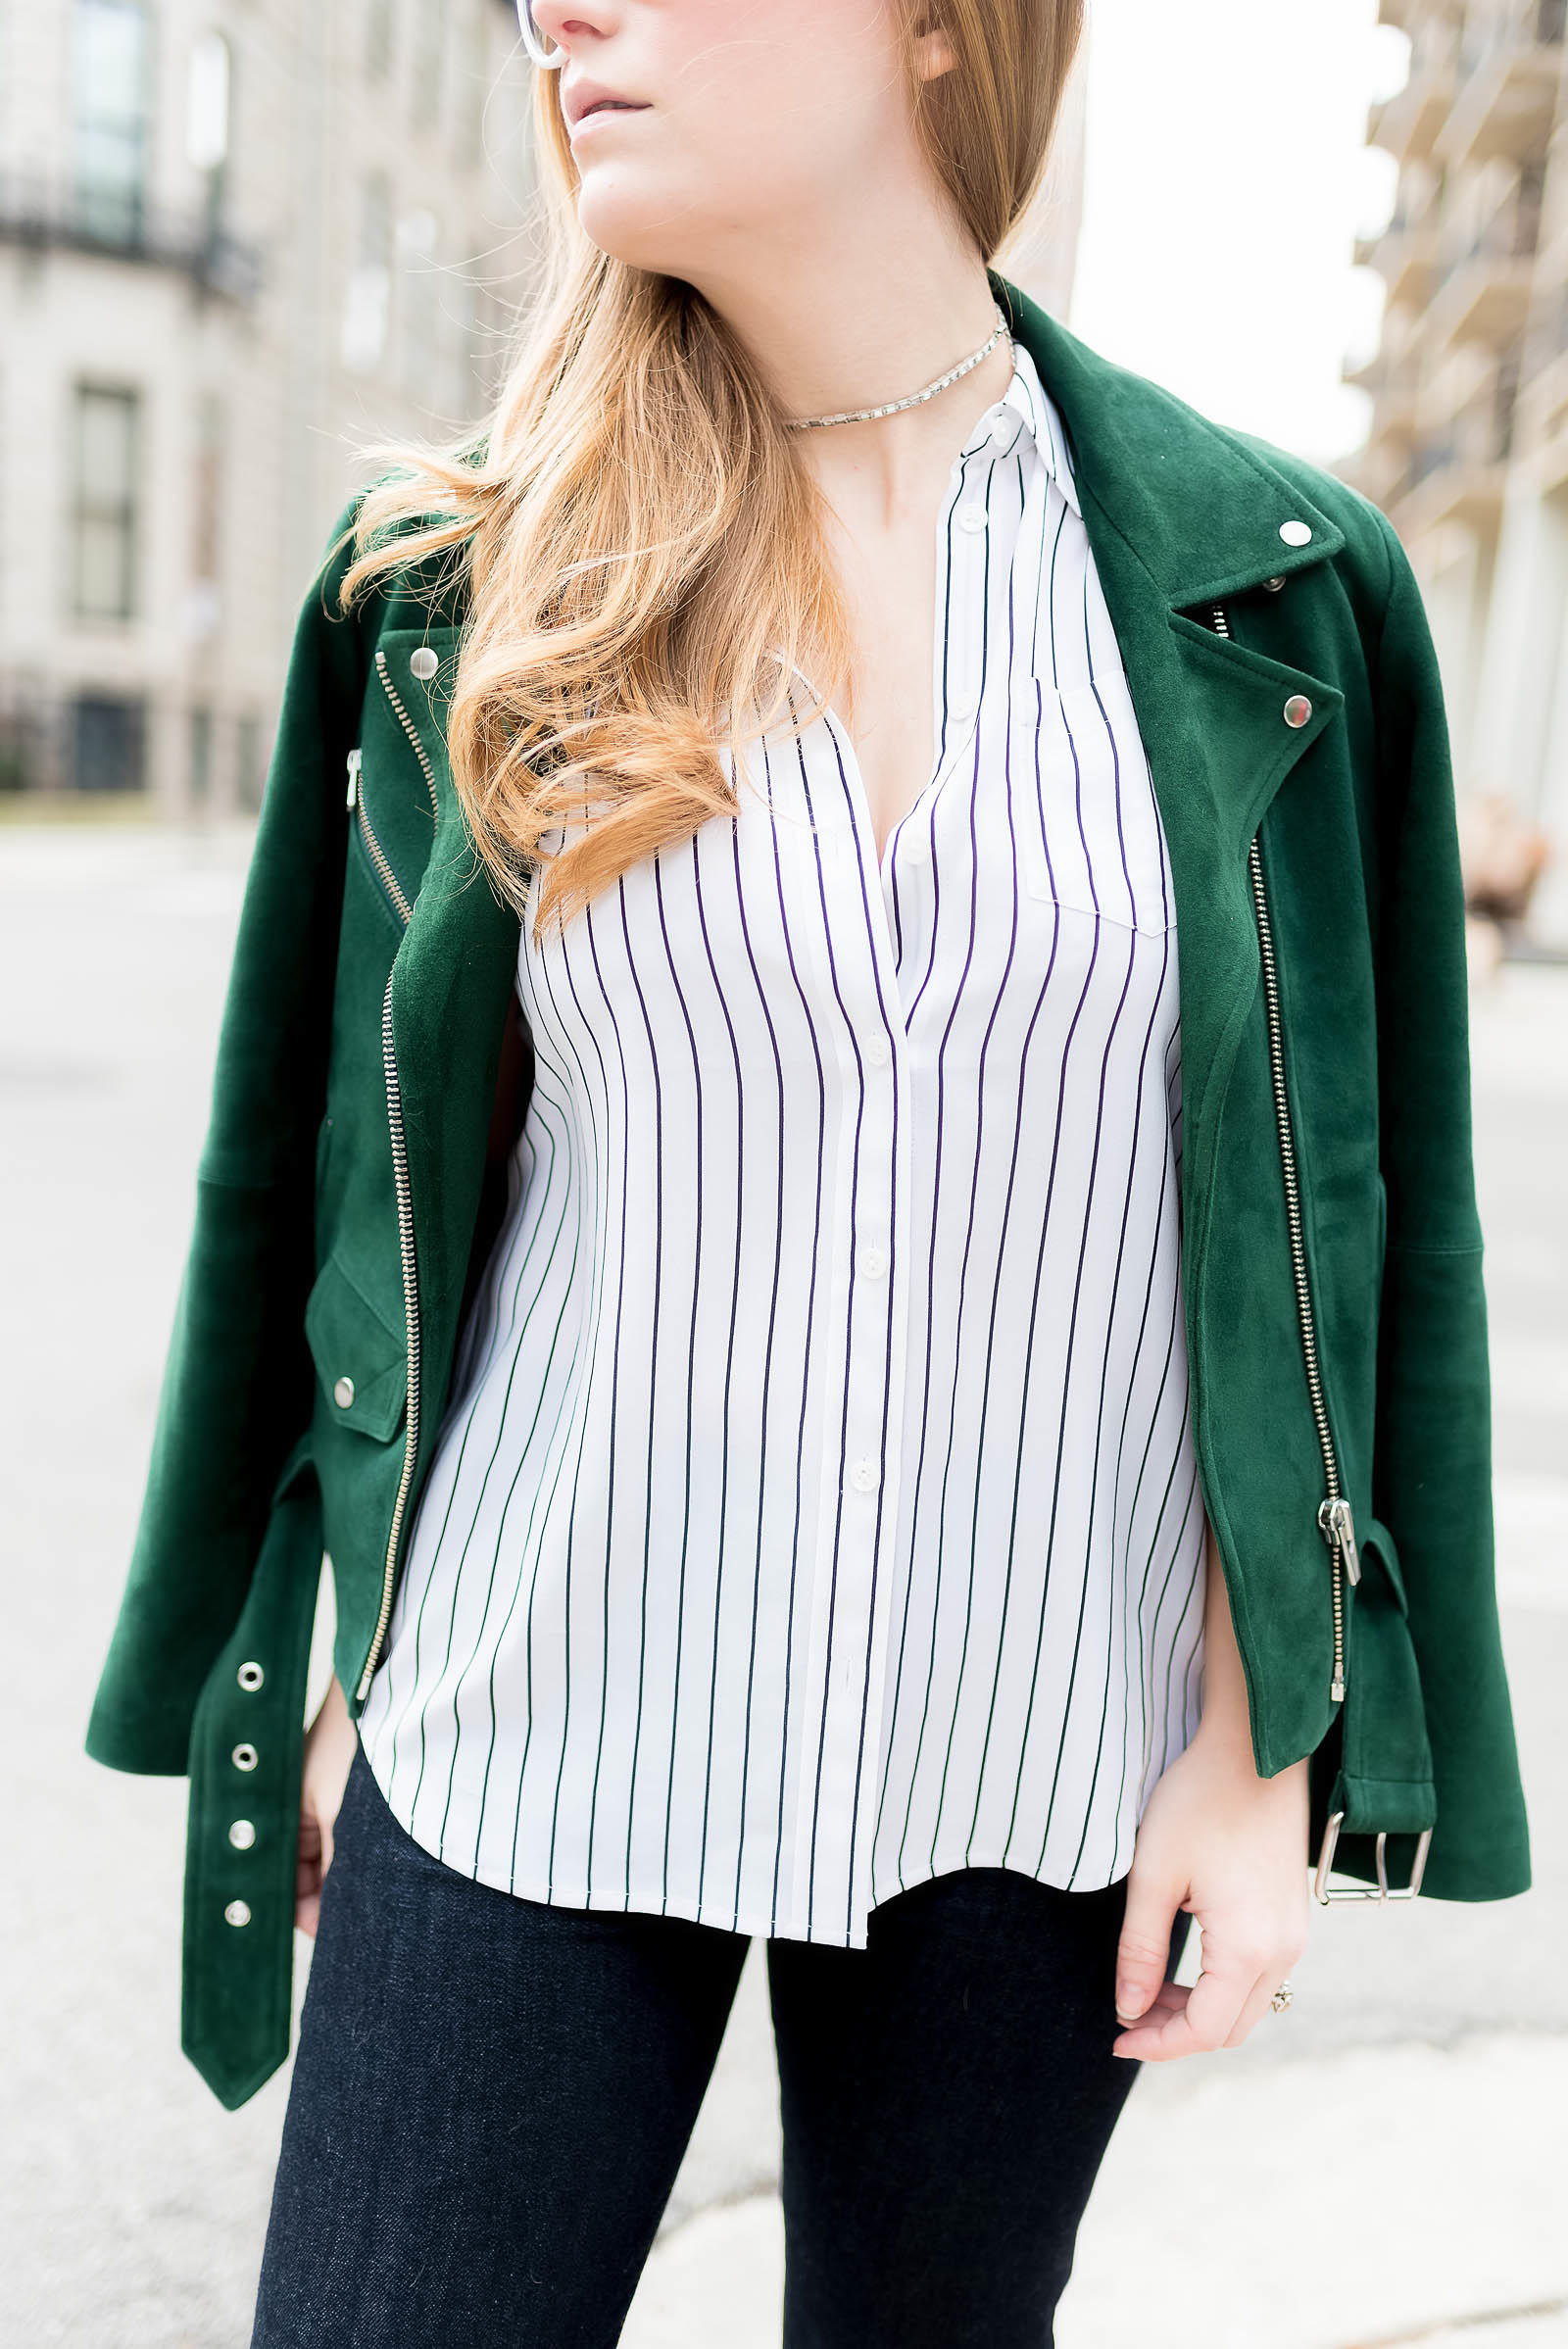 Green Suede Moto Jacket AG Jeans Cork Pumps